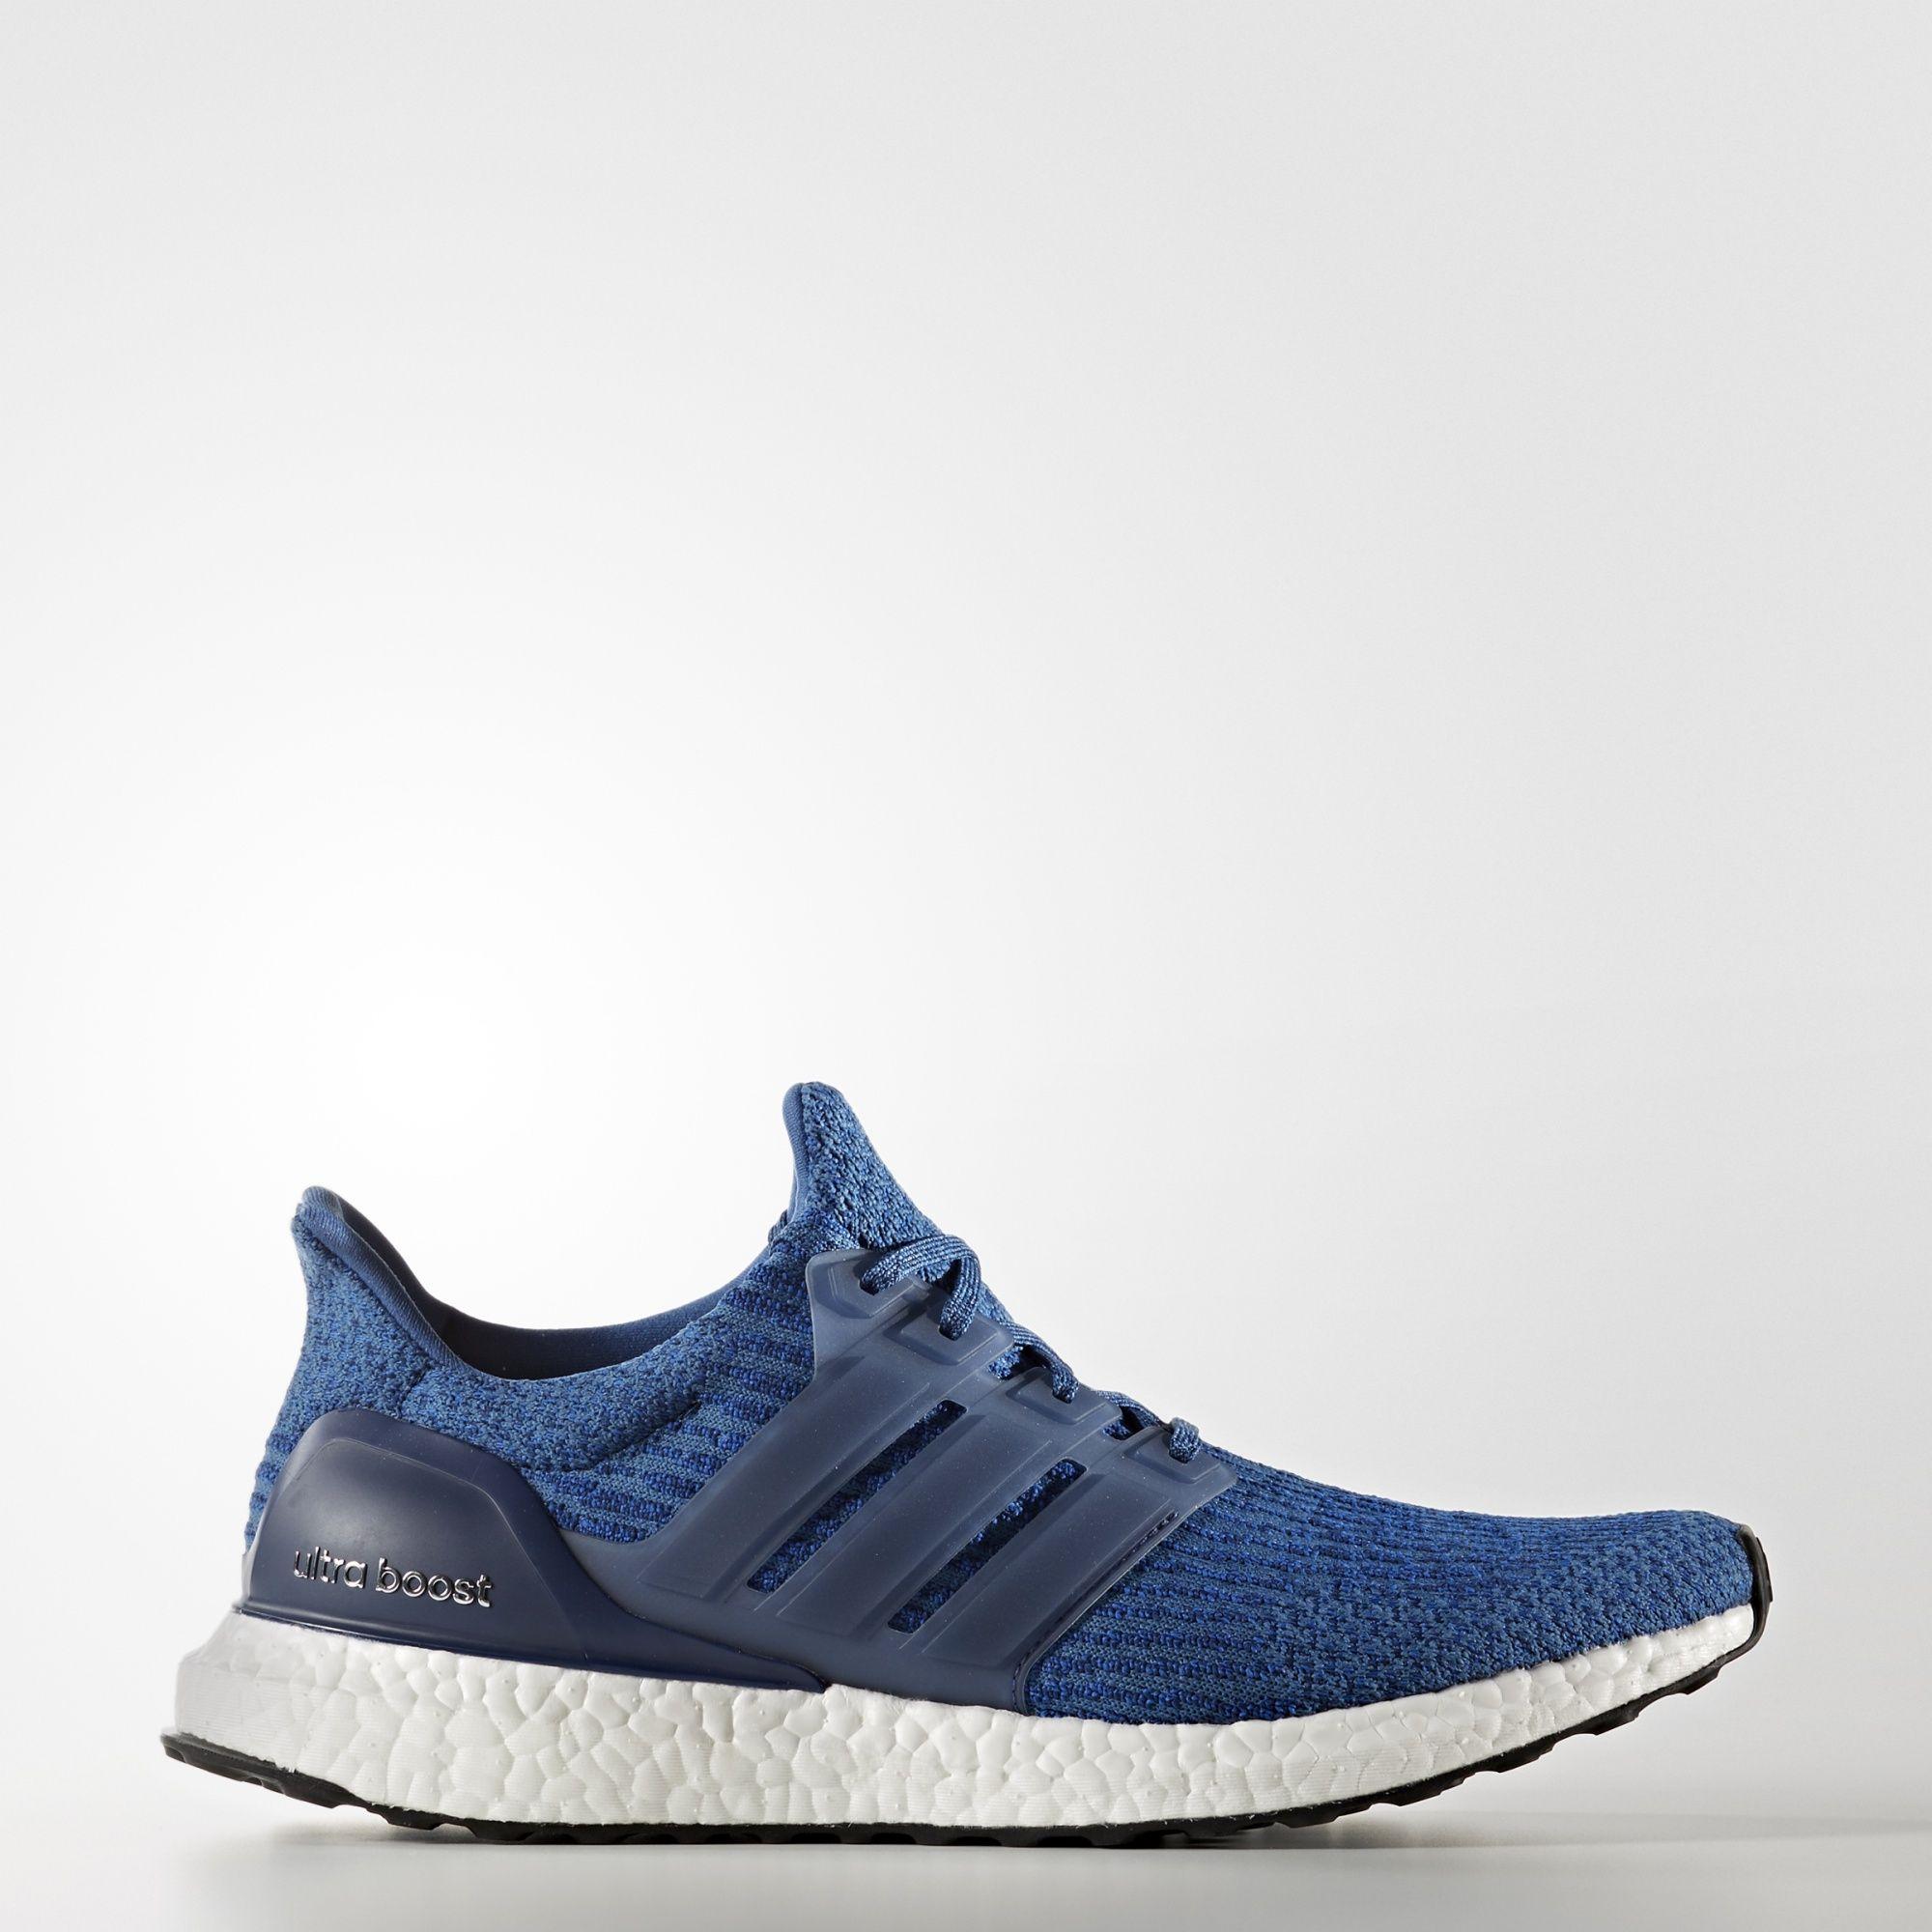 Chaussure Ultra Boost adidas bleu adidas adidas Boost France Chaussures aafc4a